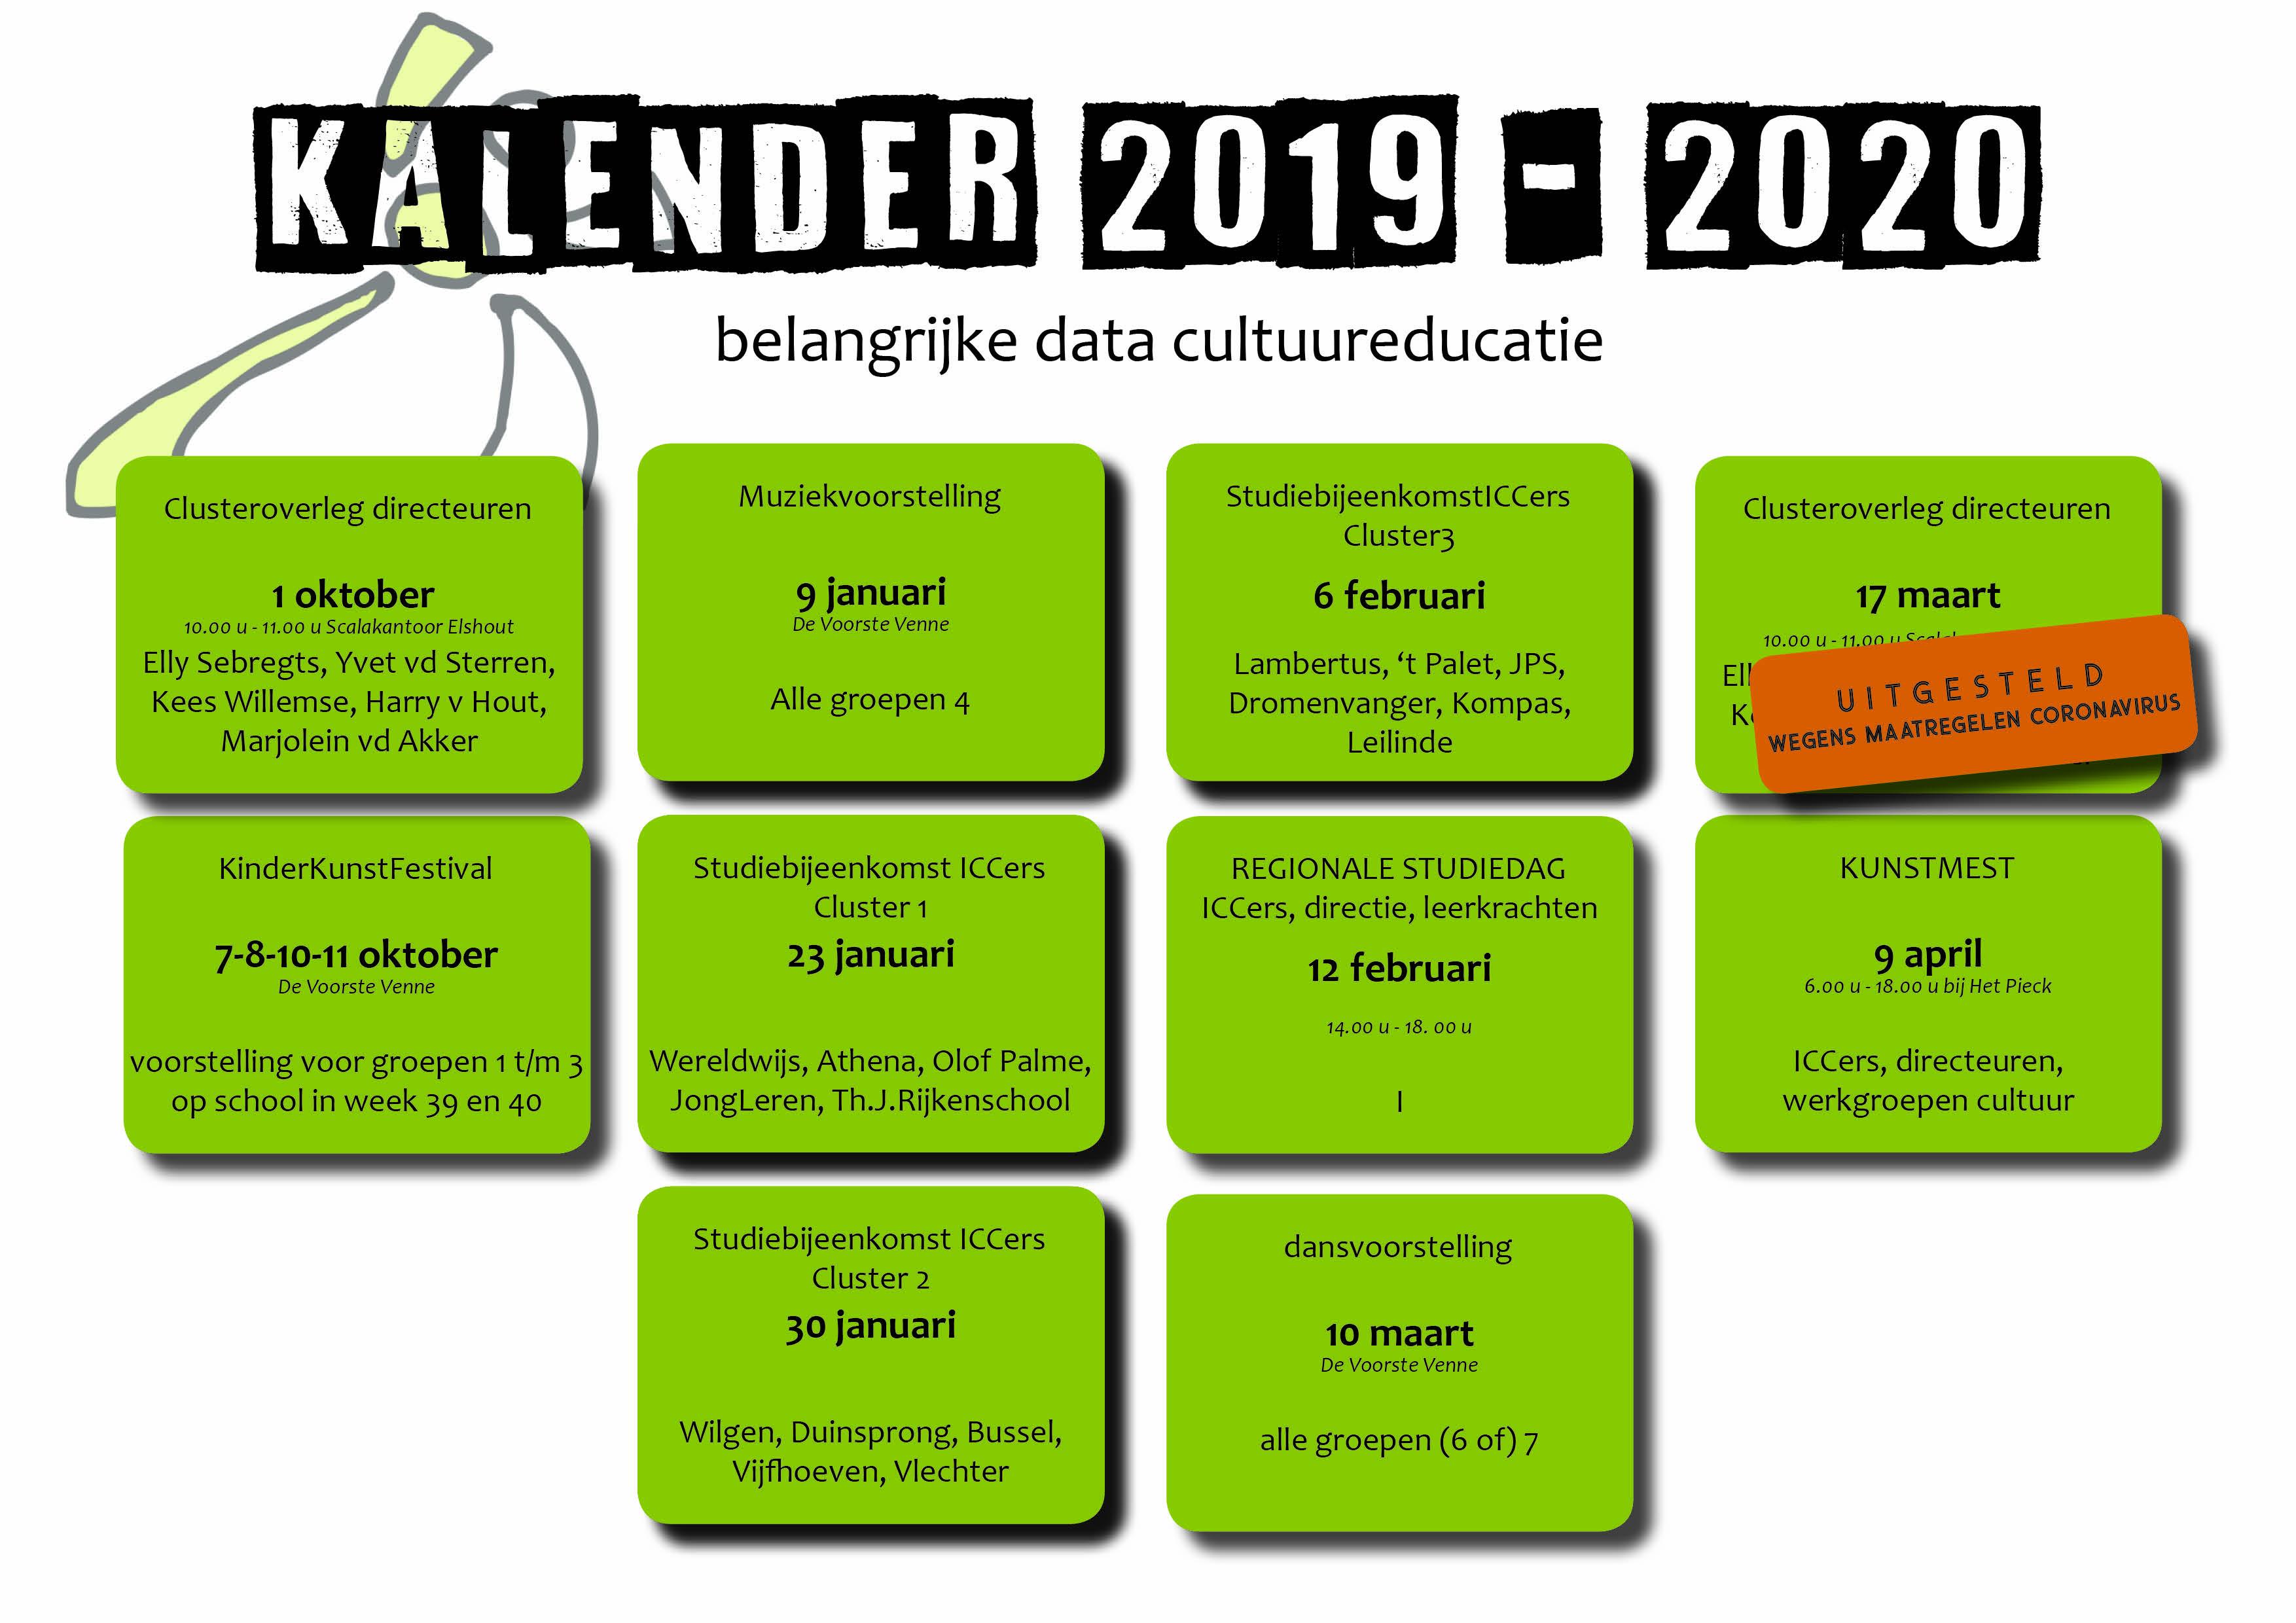 kalender1920-versiemrt20-uitstel